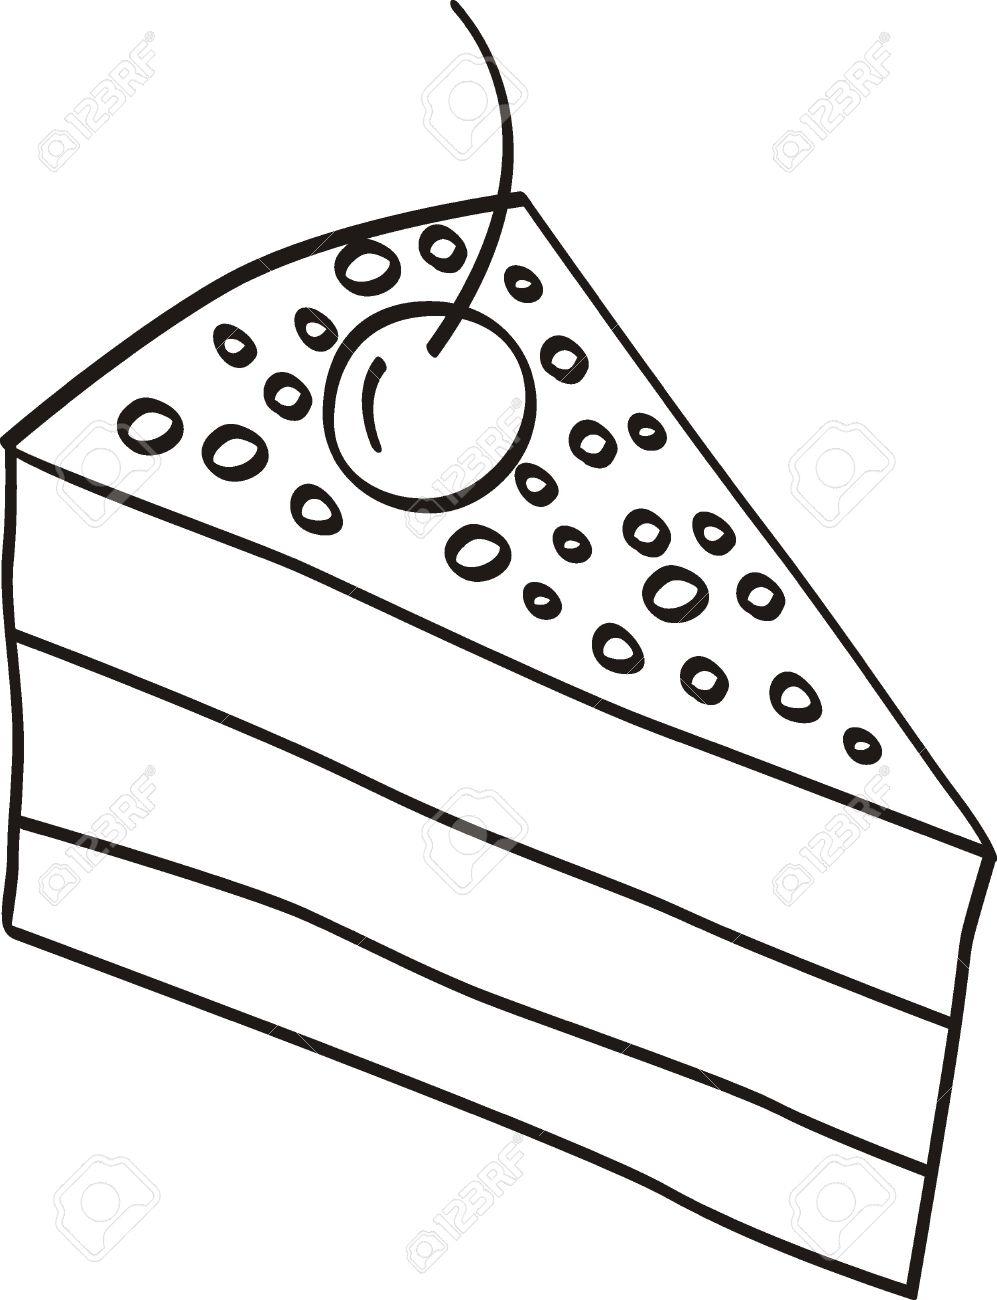 Slice of cake clip art clipart black and white Cake slice clipart black and white - ClipartFest clipart black and white